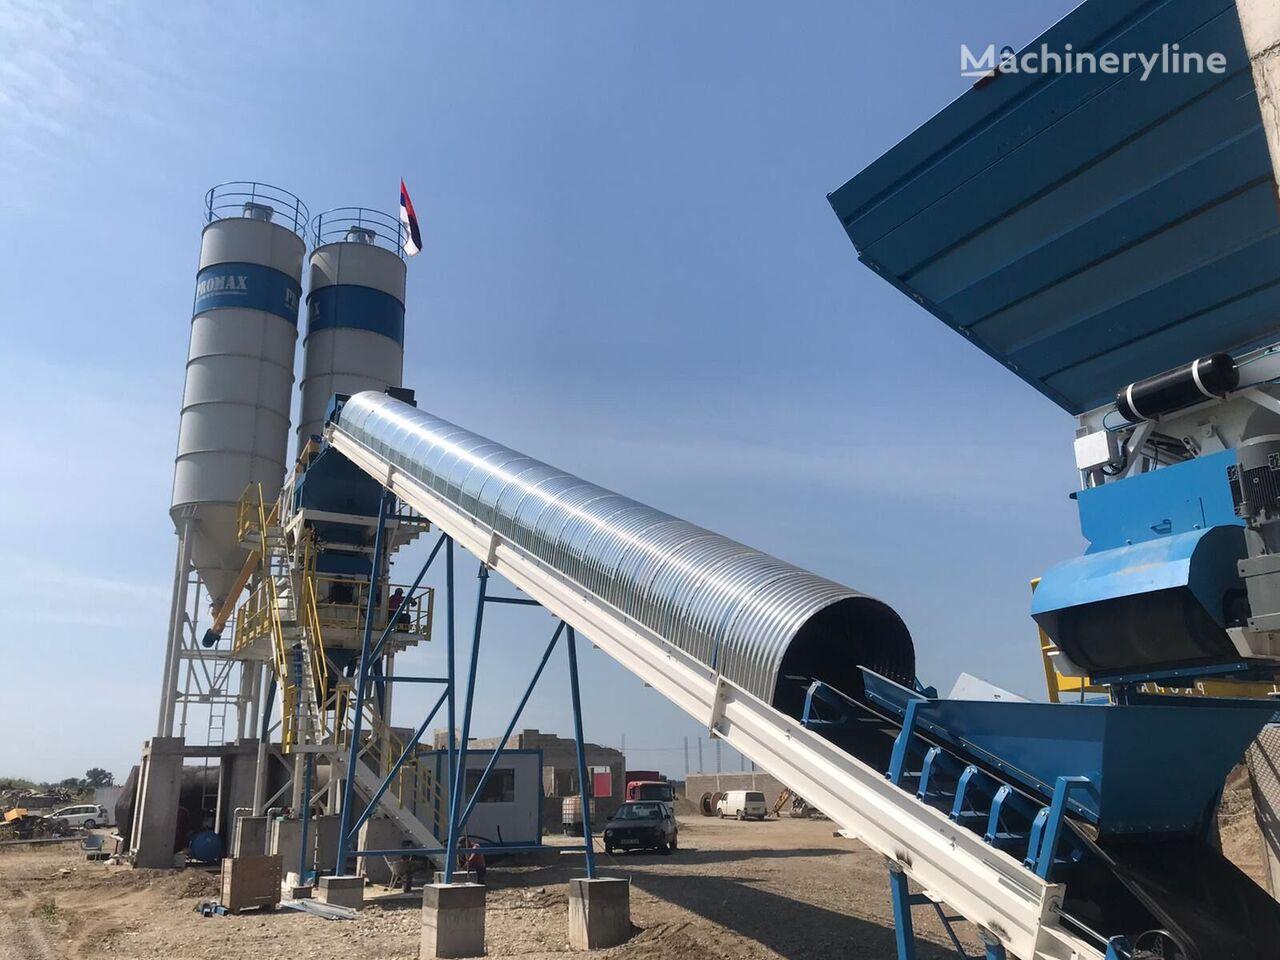 new PROMAX STATIONARY Concrete Batching Plant S100 TWN (100m³/h) concrete plant